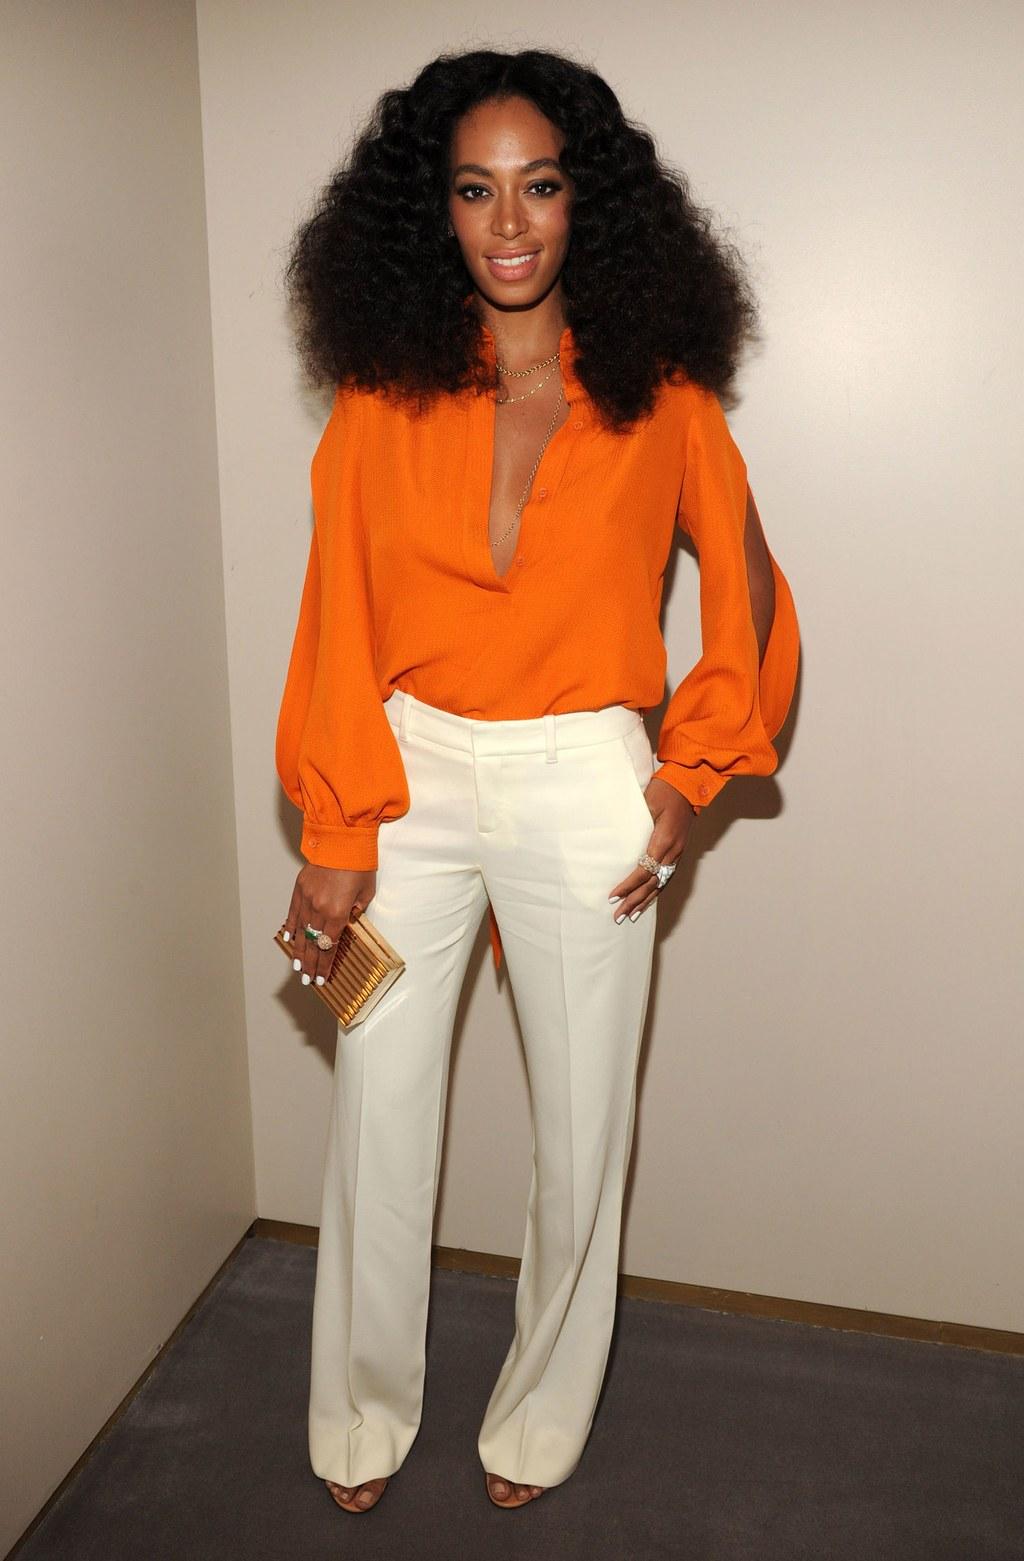 fashion-2014-06-solange-white-pants-orange-suit-chime-for-change-main.jpg